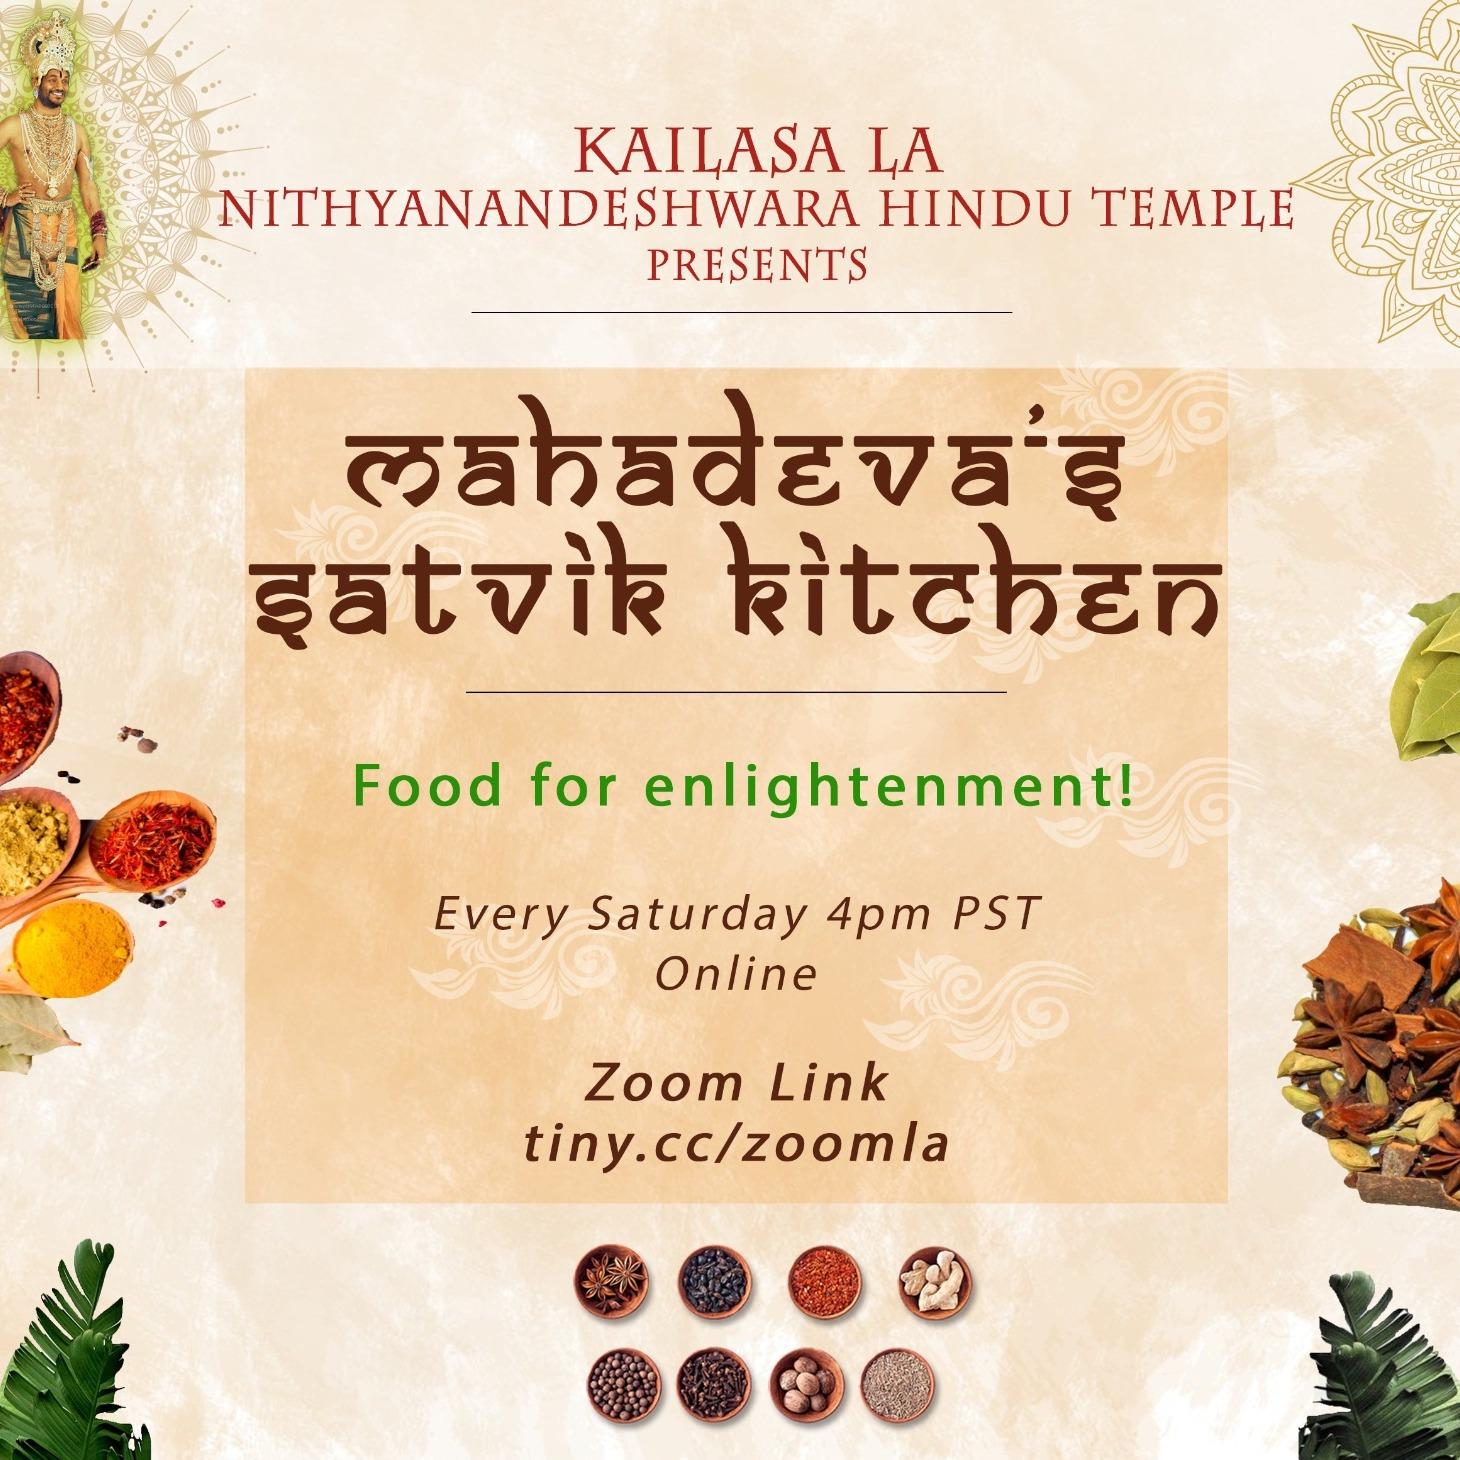 Mahadeva's Satvik Kitchen: Food for Enlightenment: Saturdays 4 pm PST